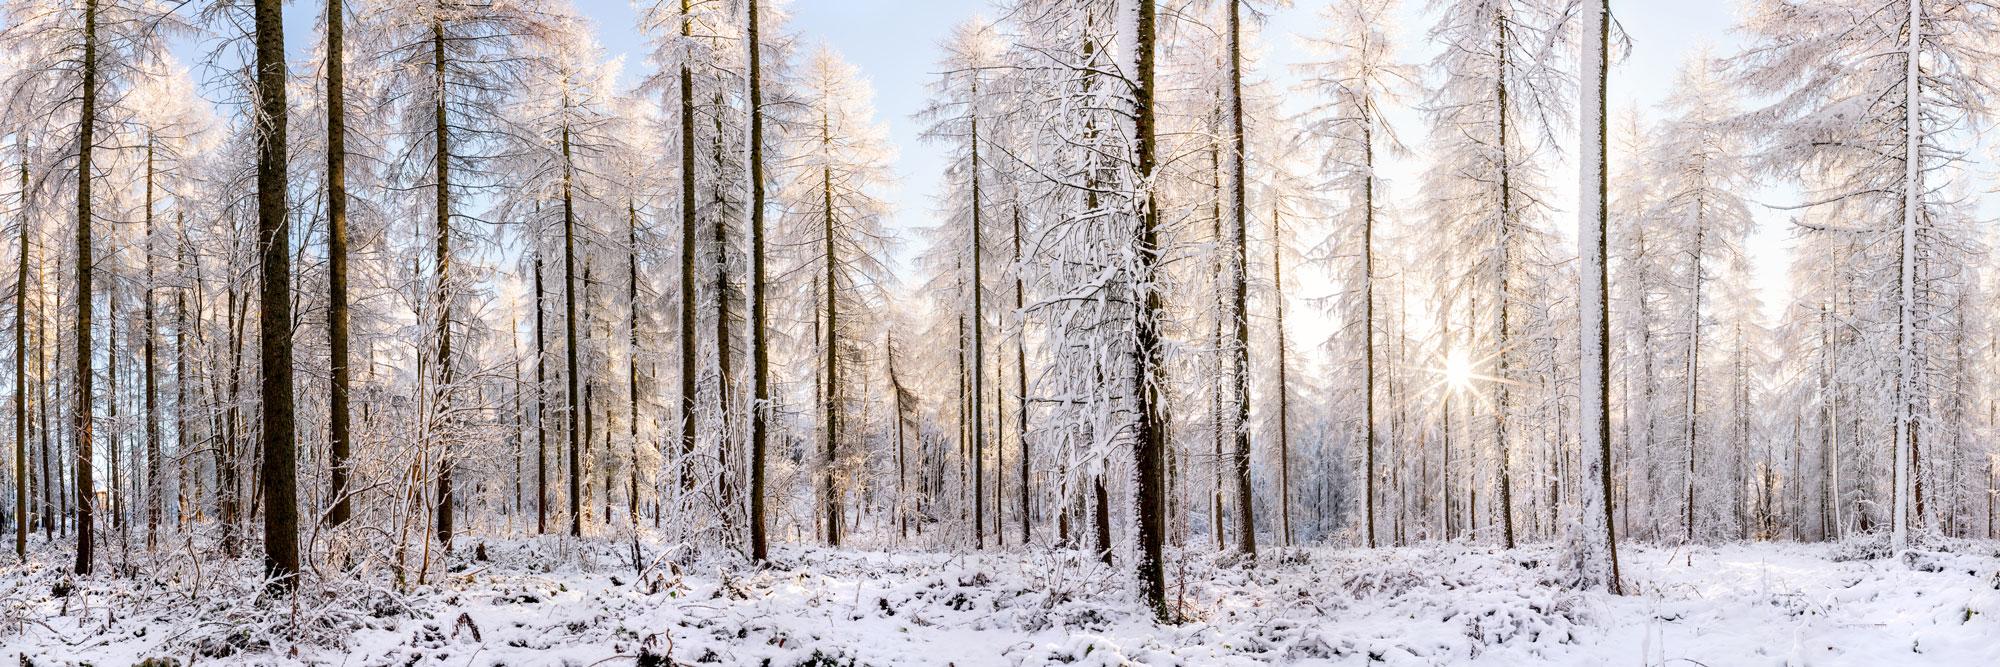 winter woodland as the sun shines through